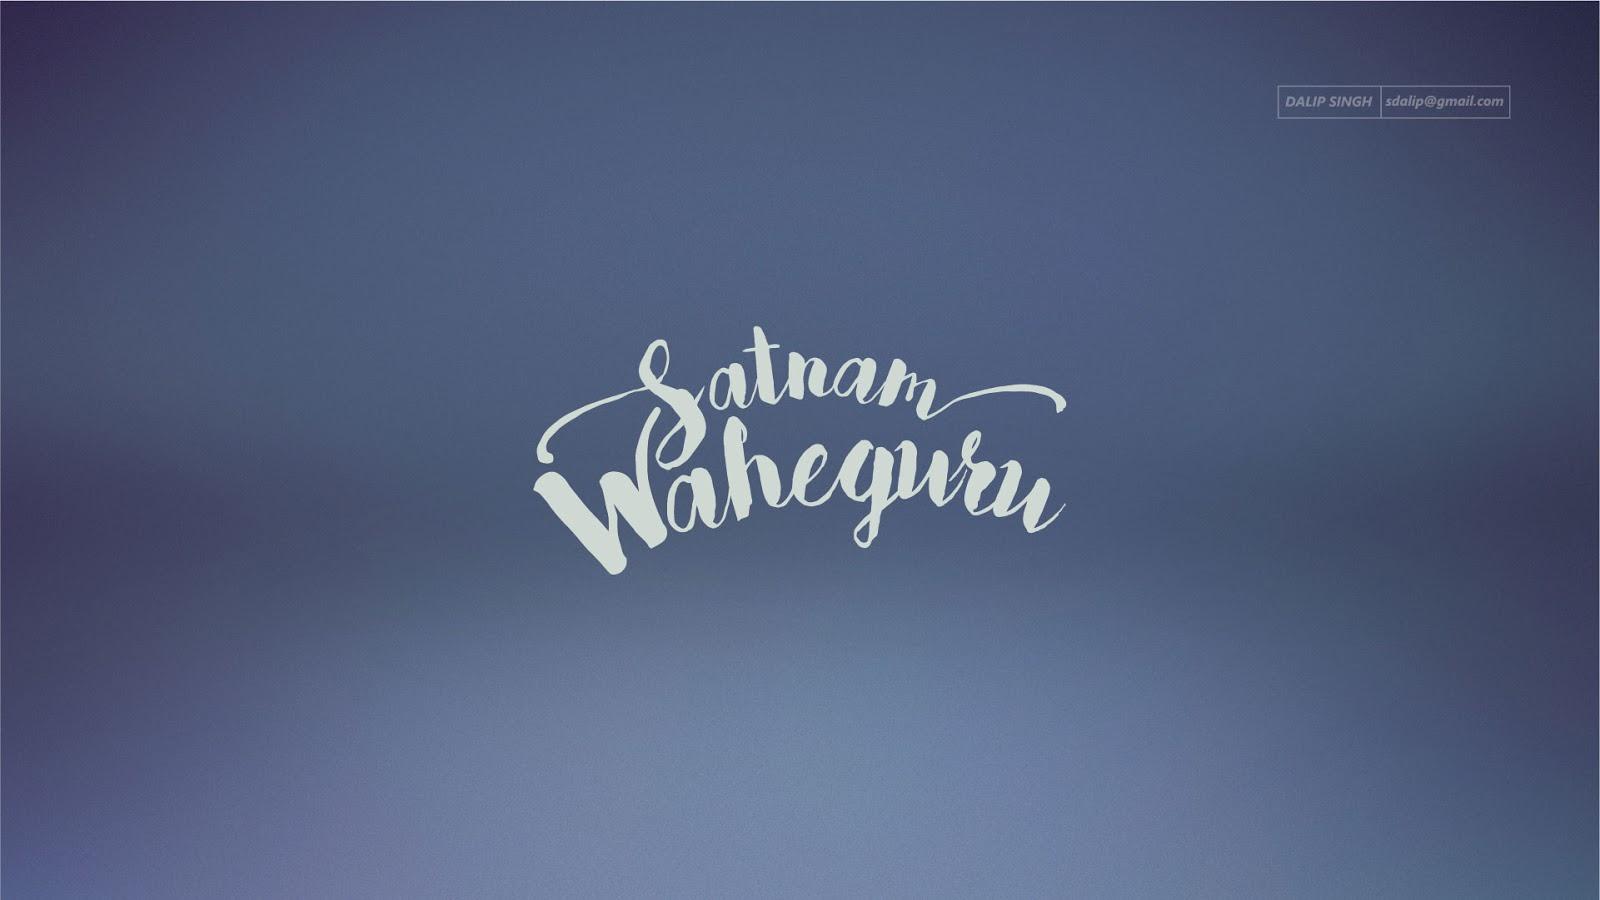 satnam shri waheguru ji sikhism wallpapers sikh guru ji sri